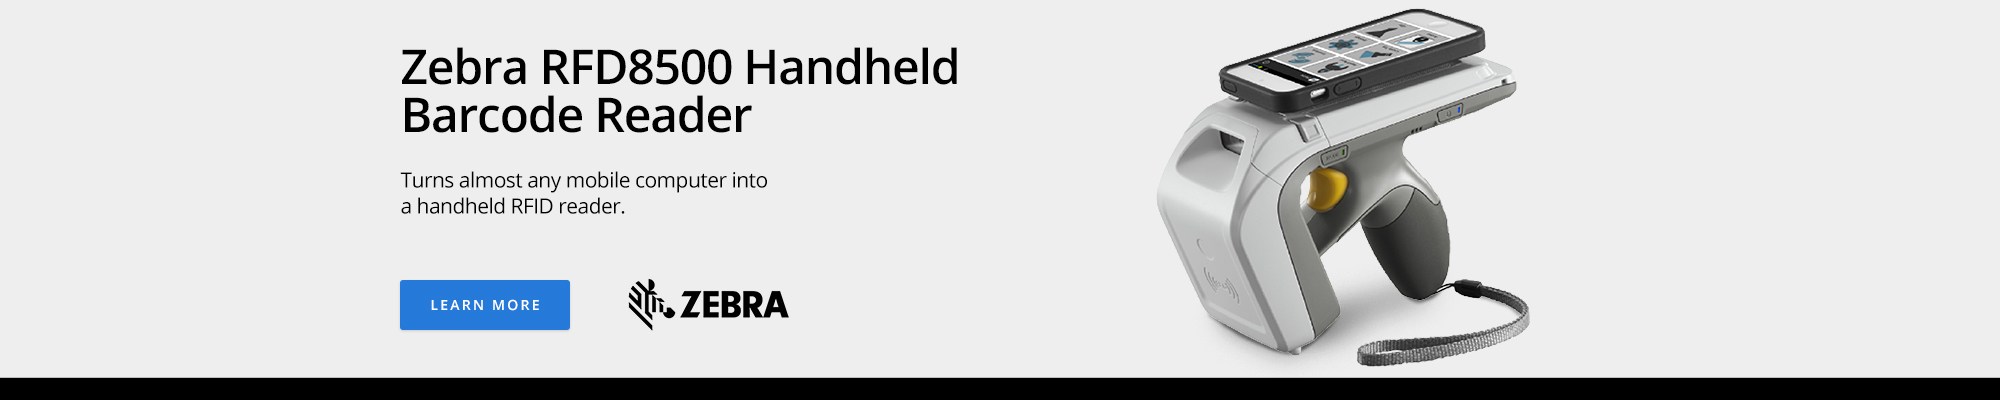 Zebra RFD8500 Handheld Barcode Reader